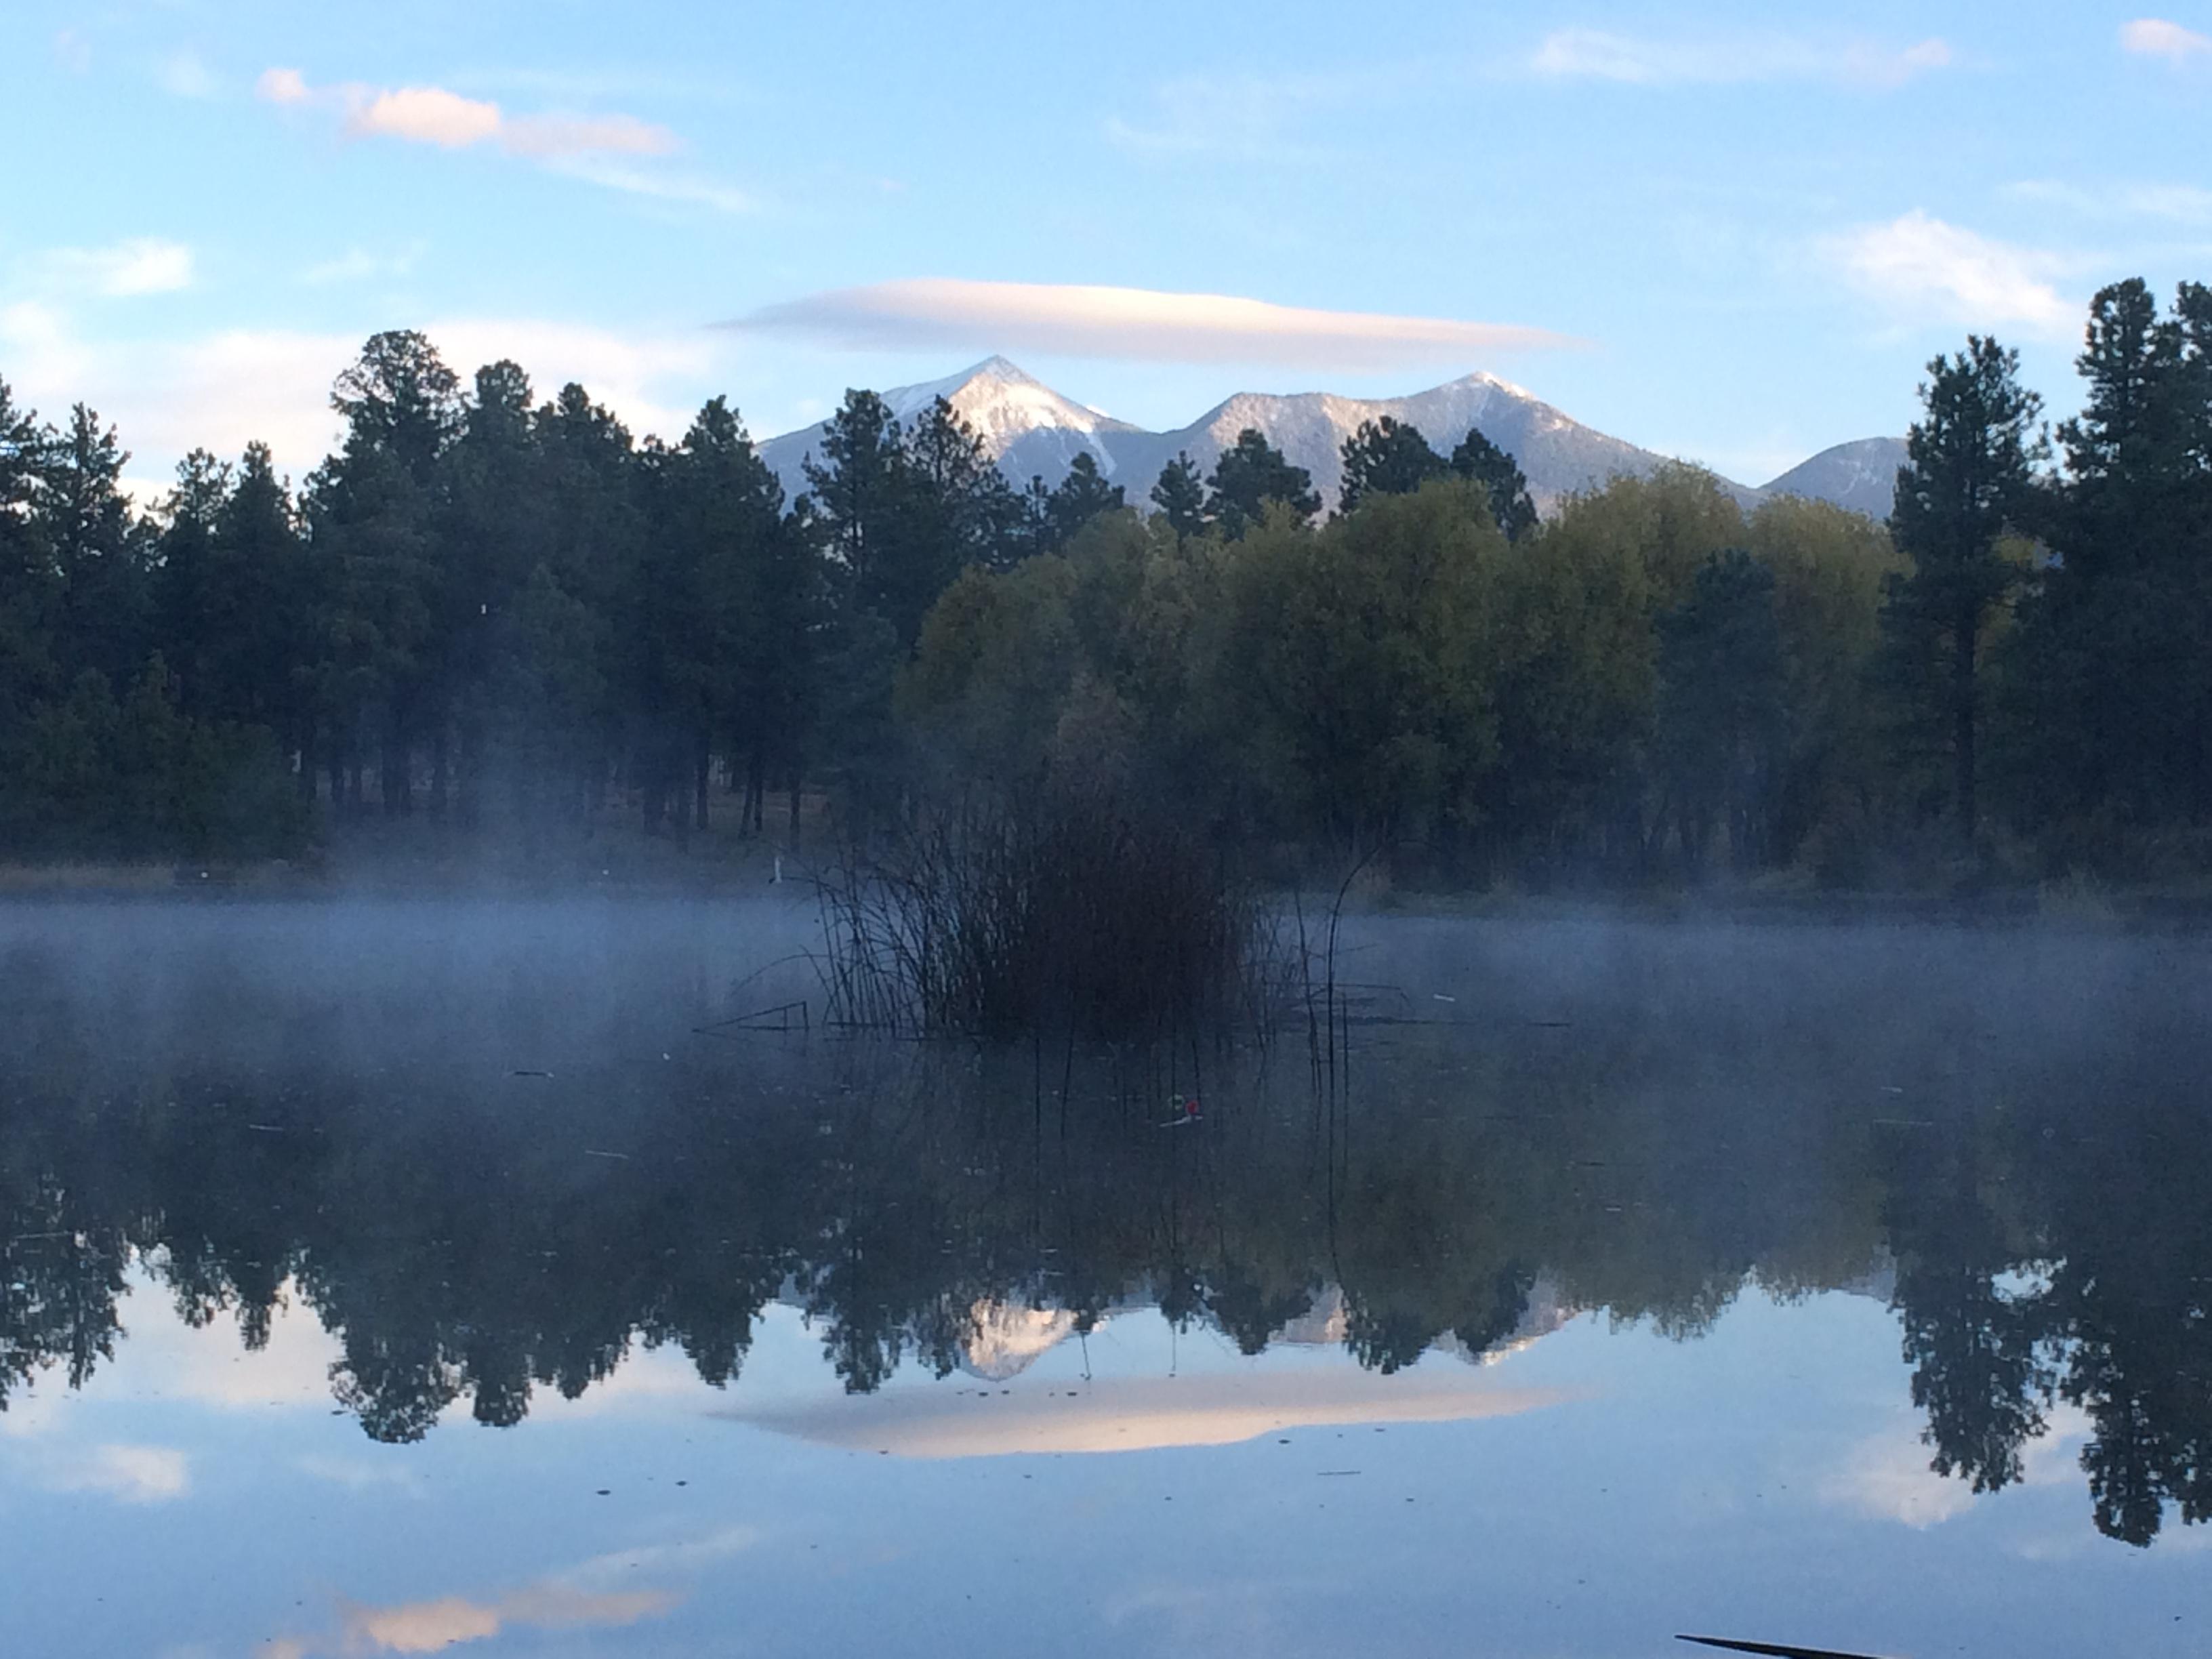 Francis Short Pond - Willow Bend Environmental Center, Flagstaff, AZ